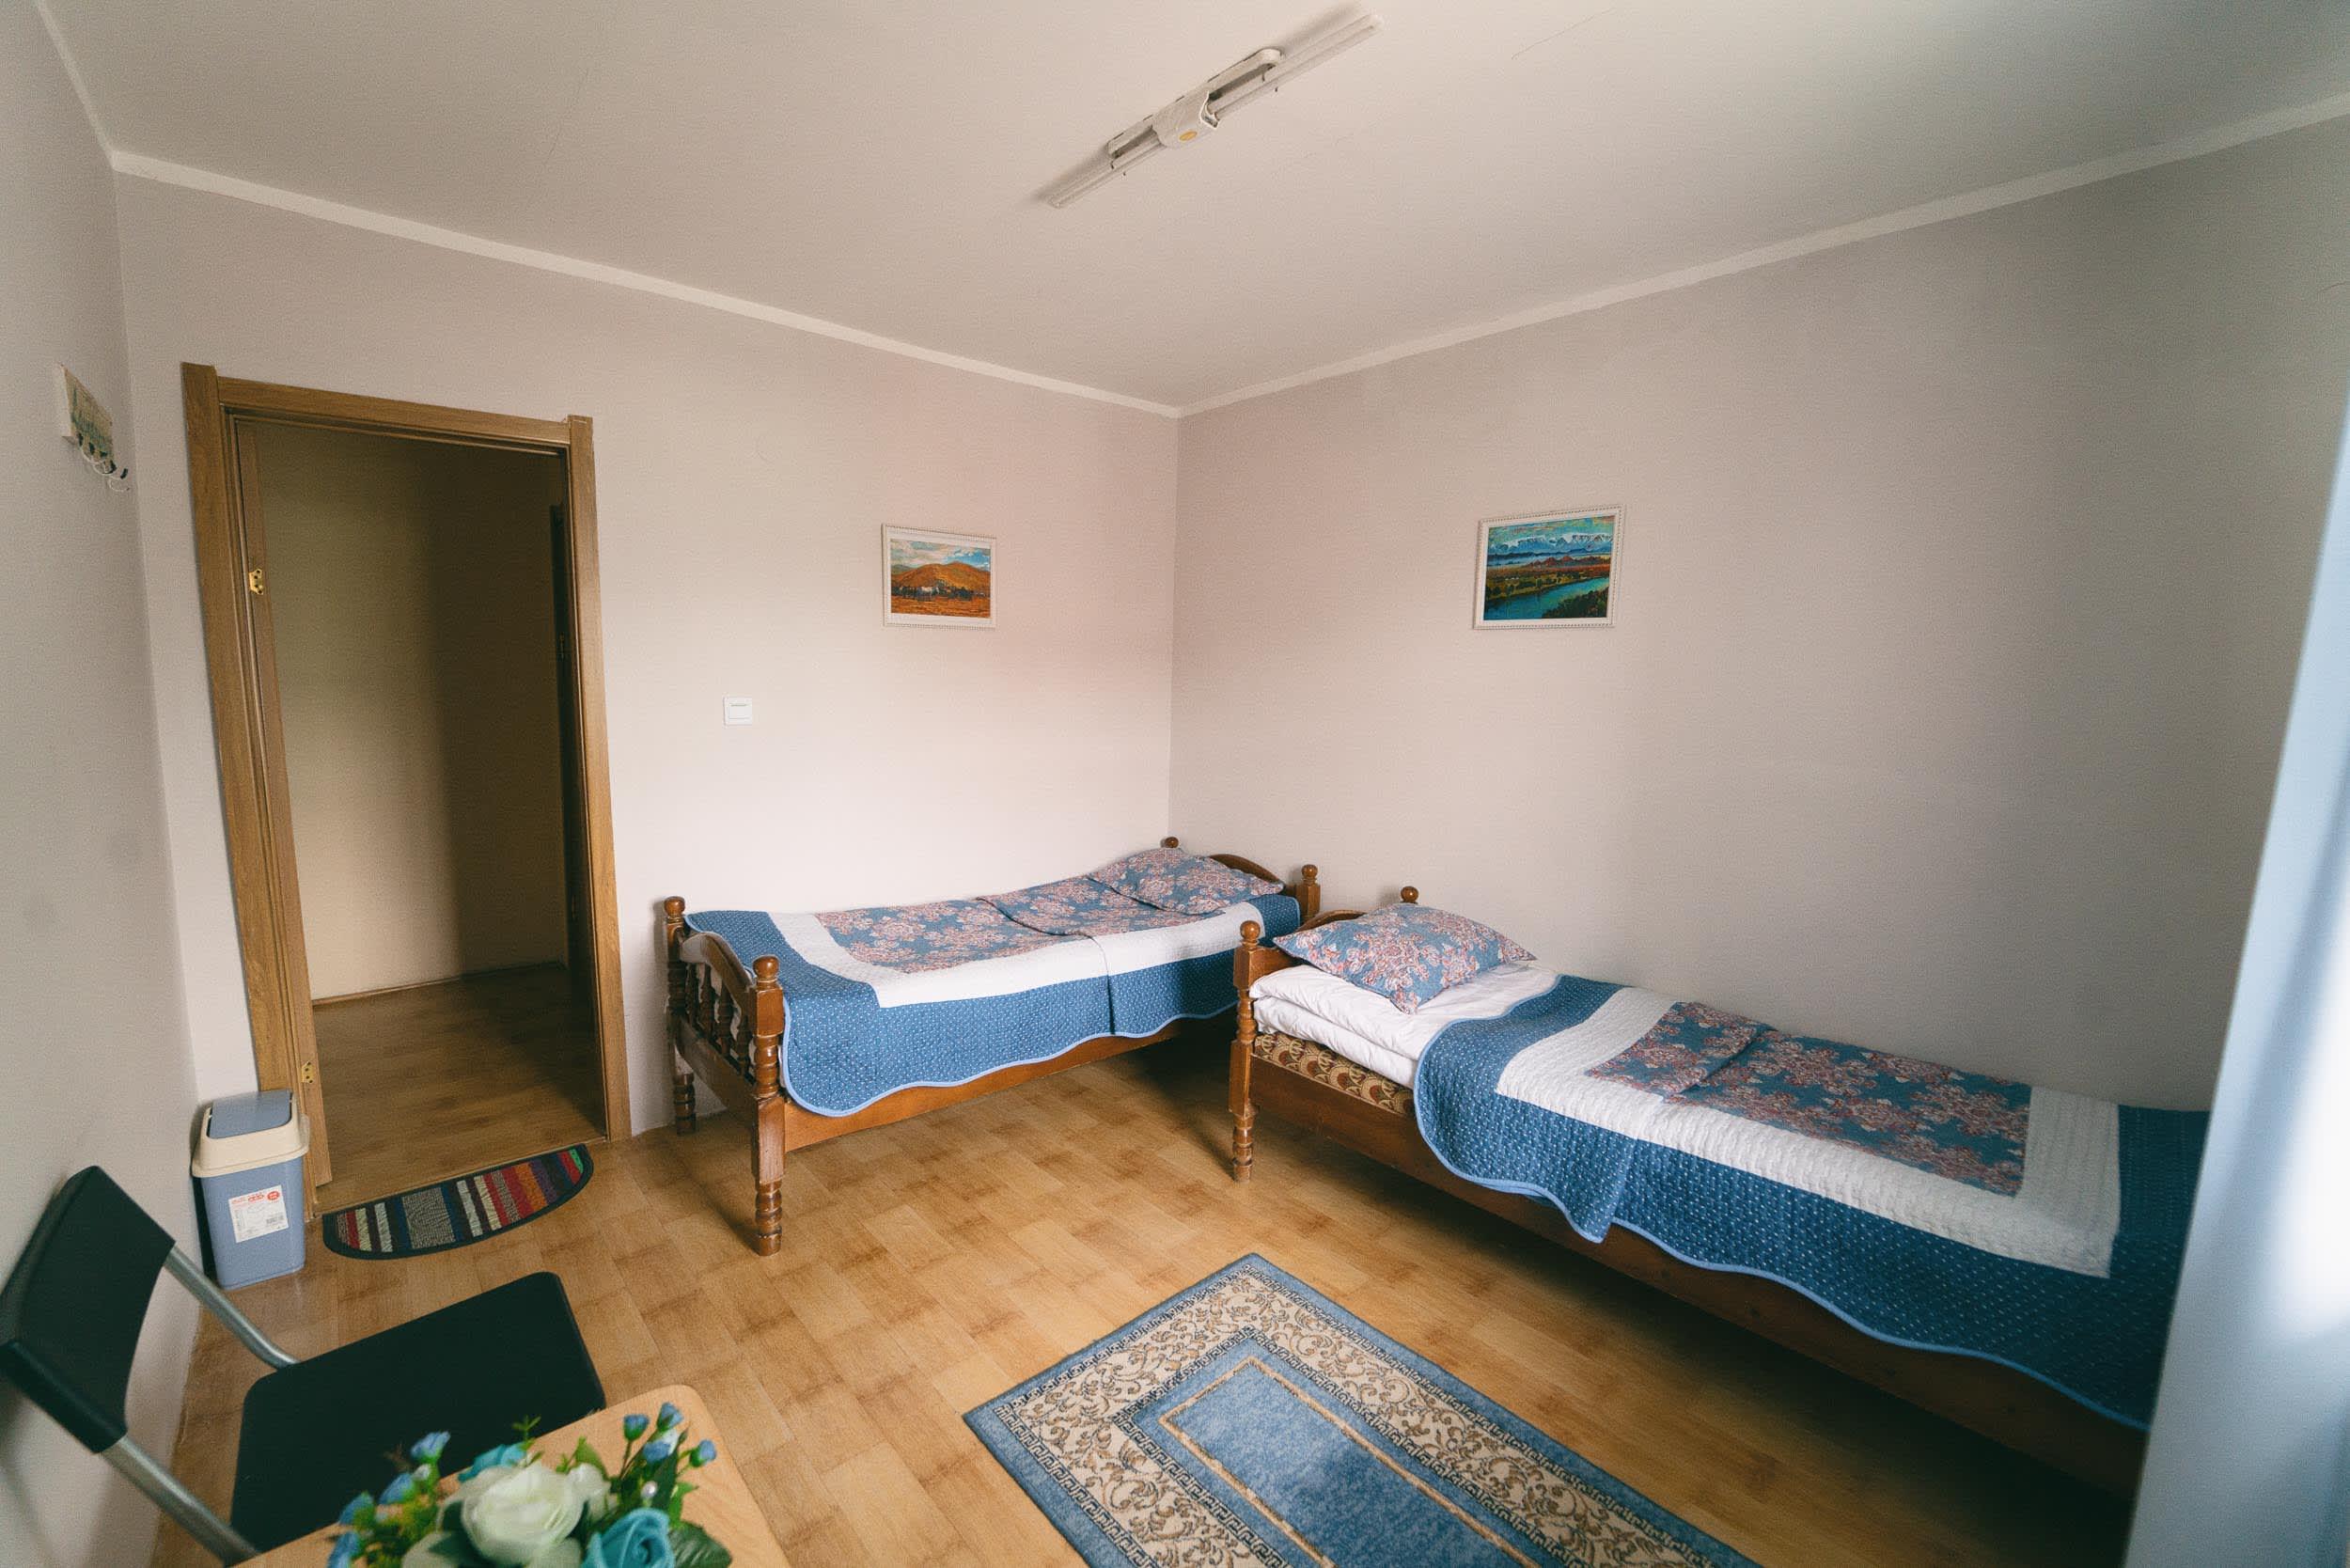 HOSTEL - Town Yard Hostel